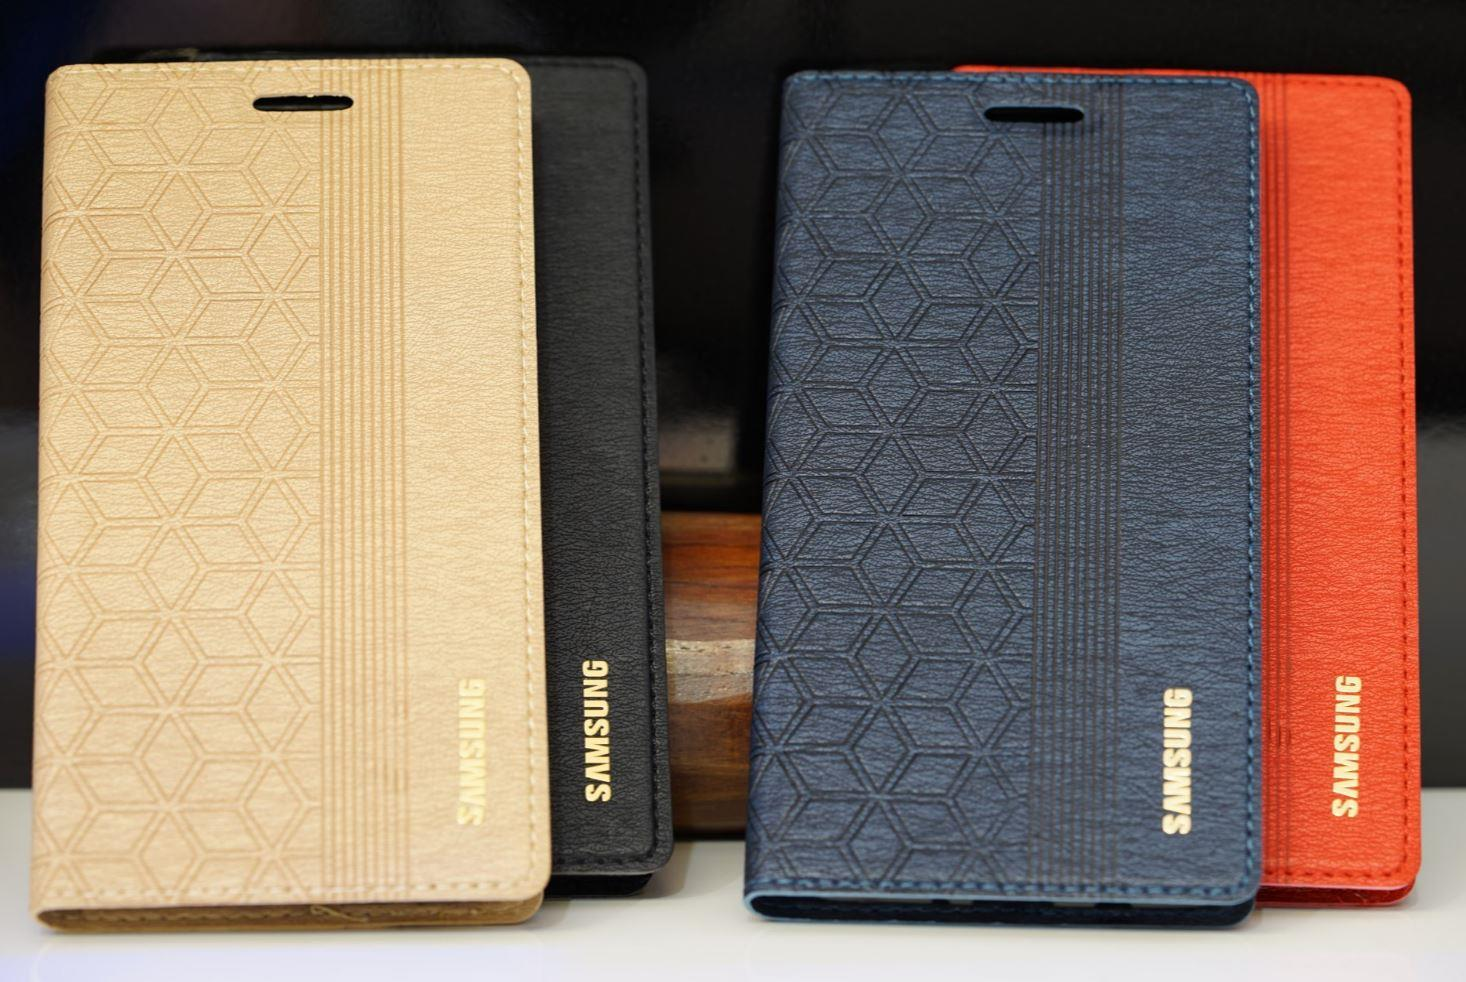 buy online 60f3b 856a2 Samsung J3 J5 J510 J7 J710 Prime 2016 Trendy Standable Flip Case Cover